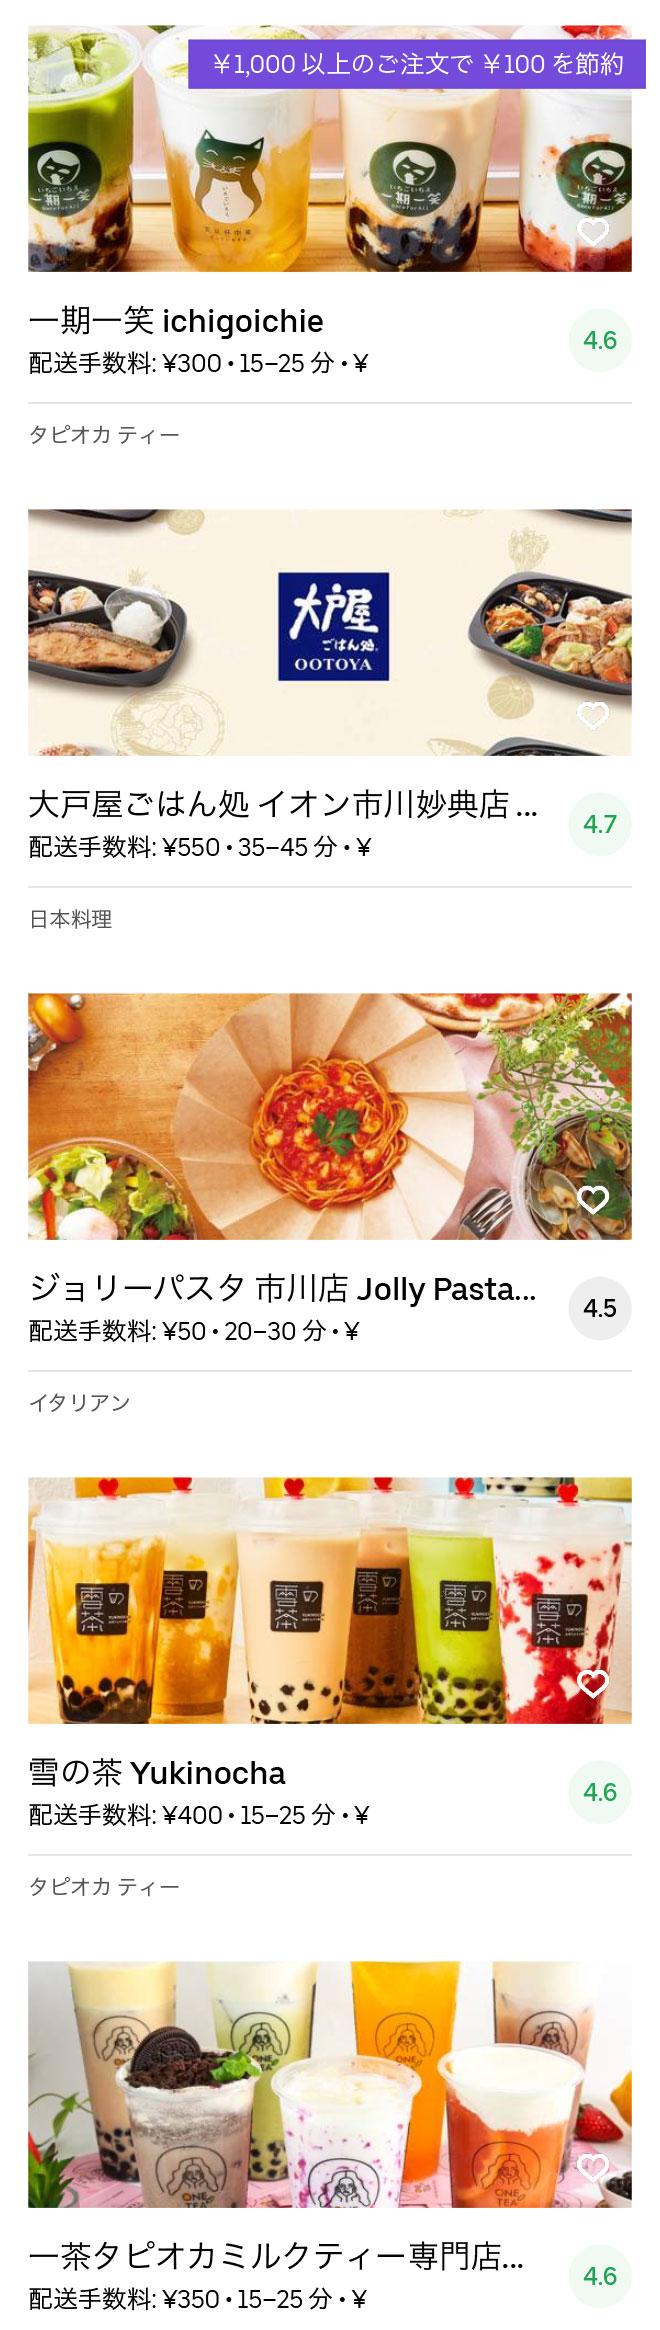 Ichikawa menu 2004 05